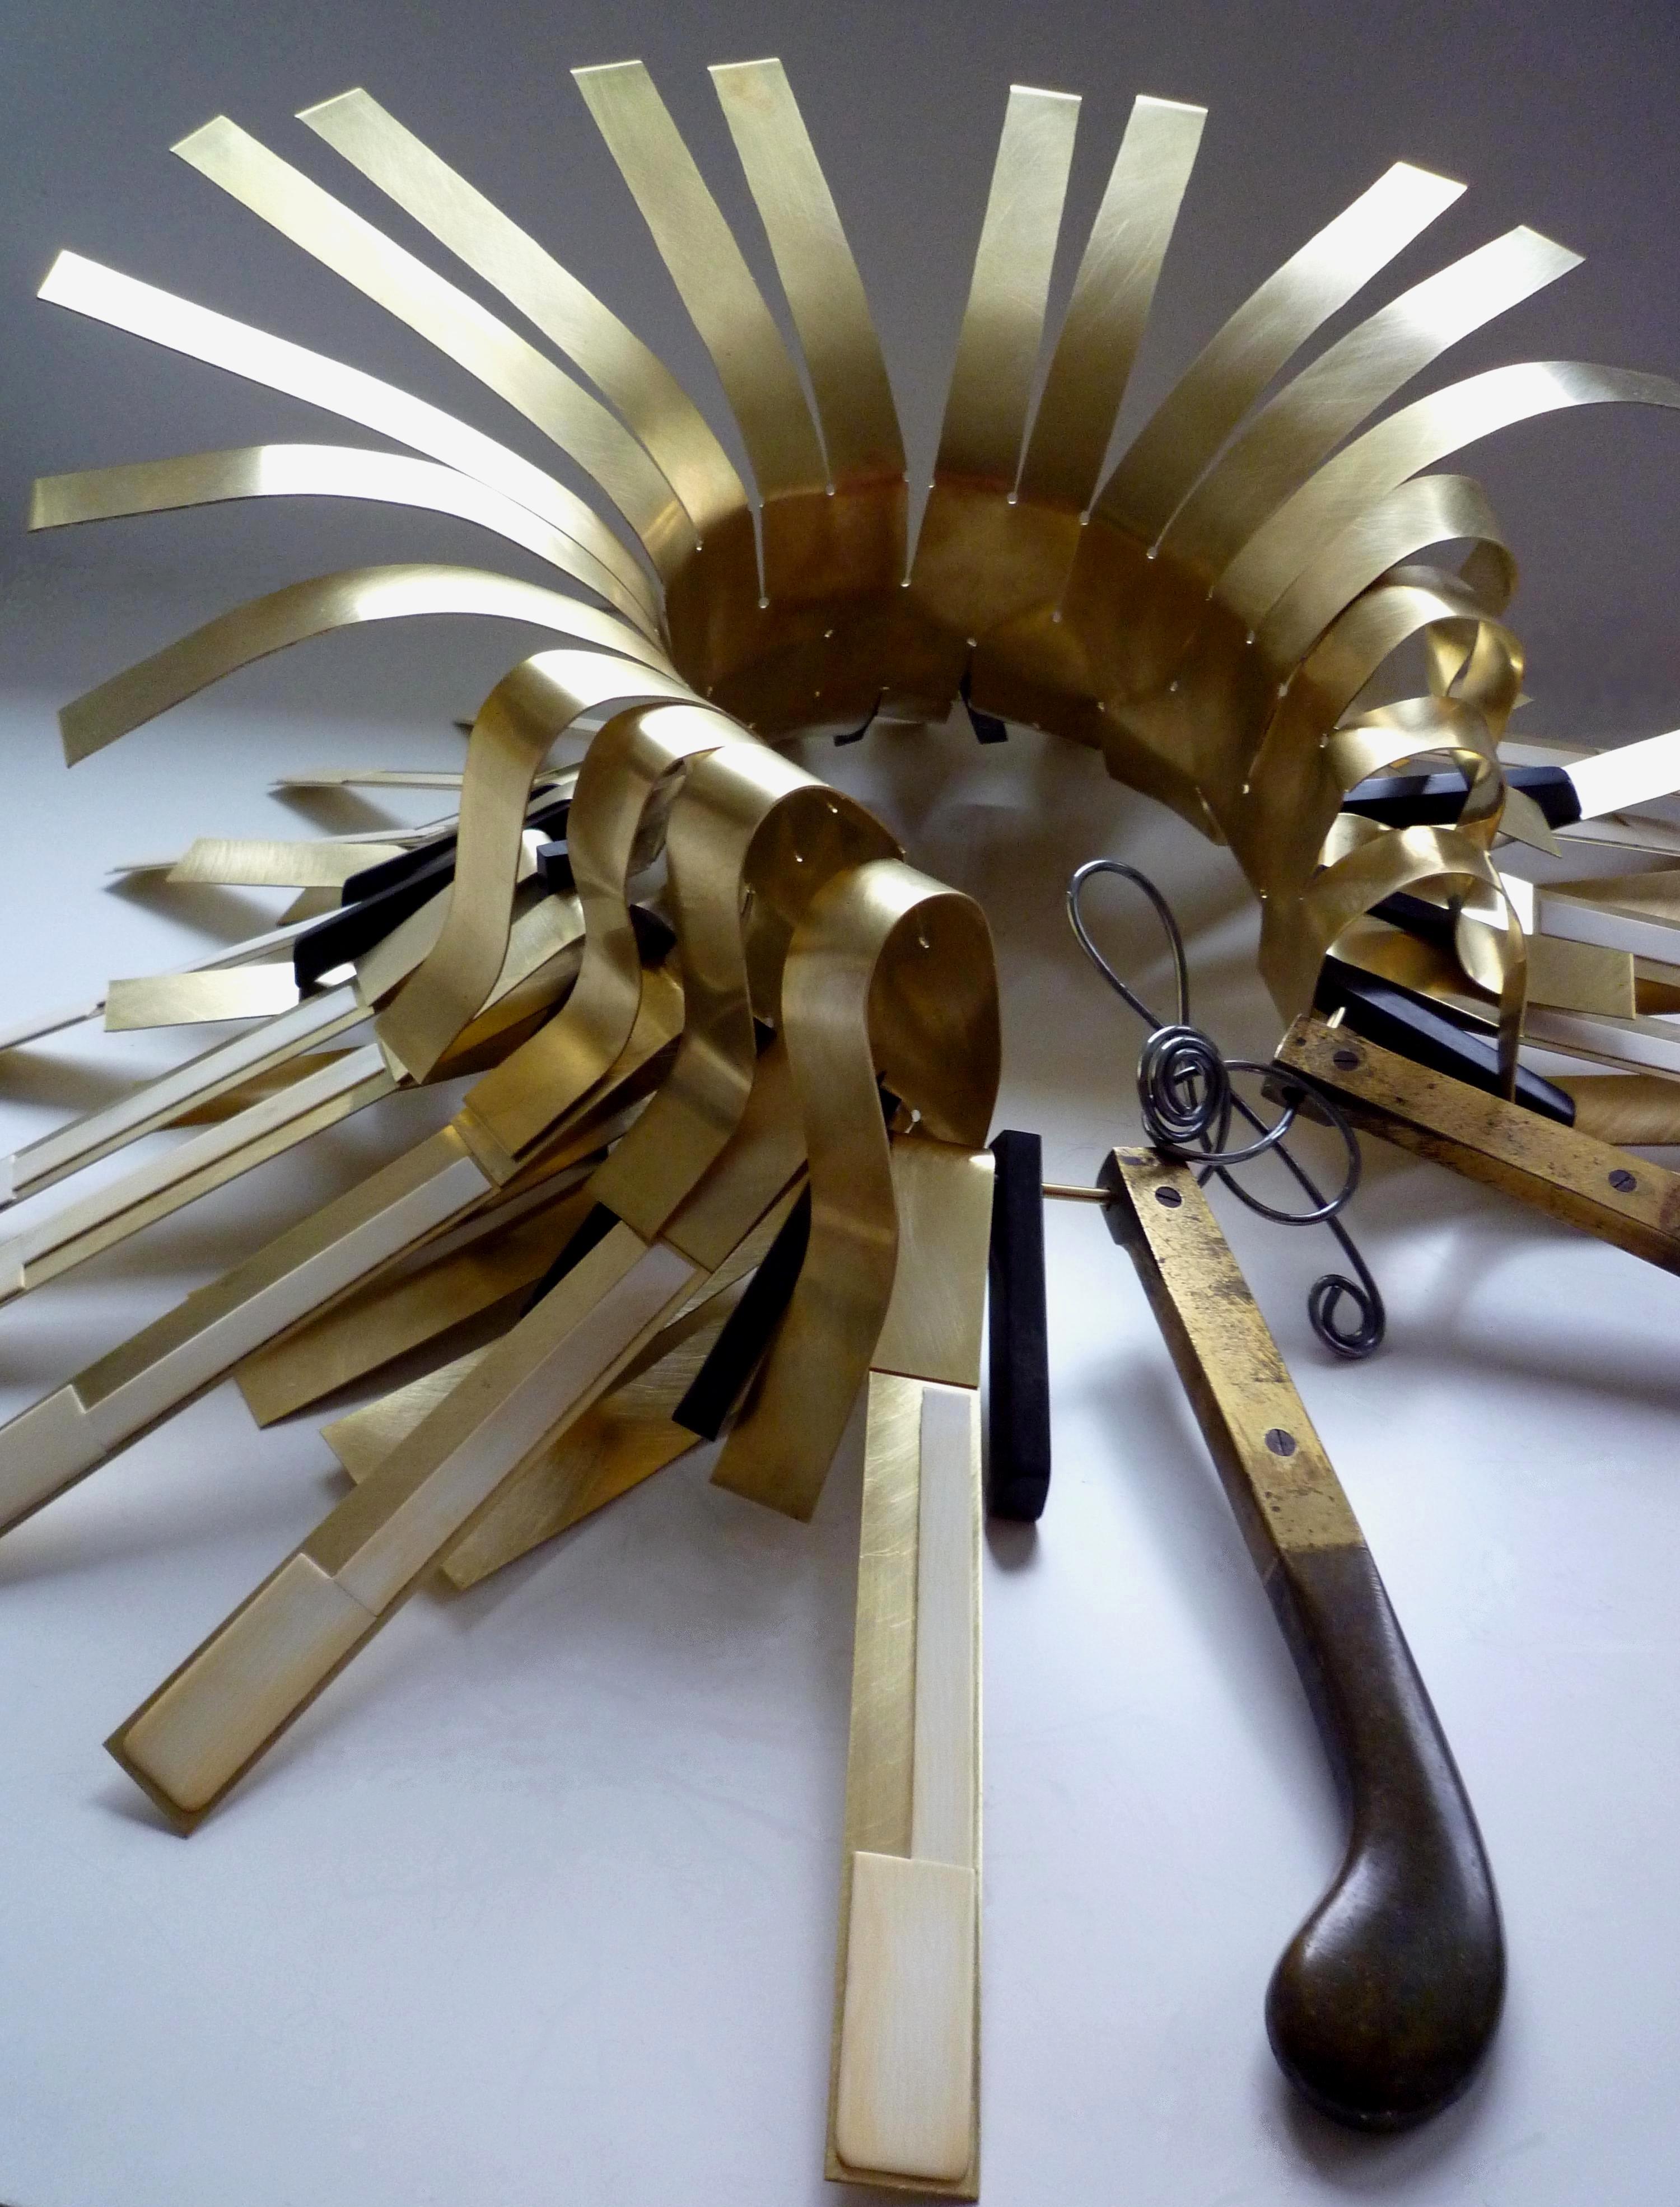 Alina Alamorean, Chopin, halssieraad, 2012. Collectie S. Thierry-de Saint Rapt, metaal